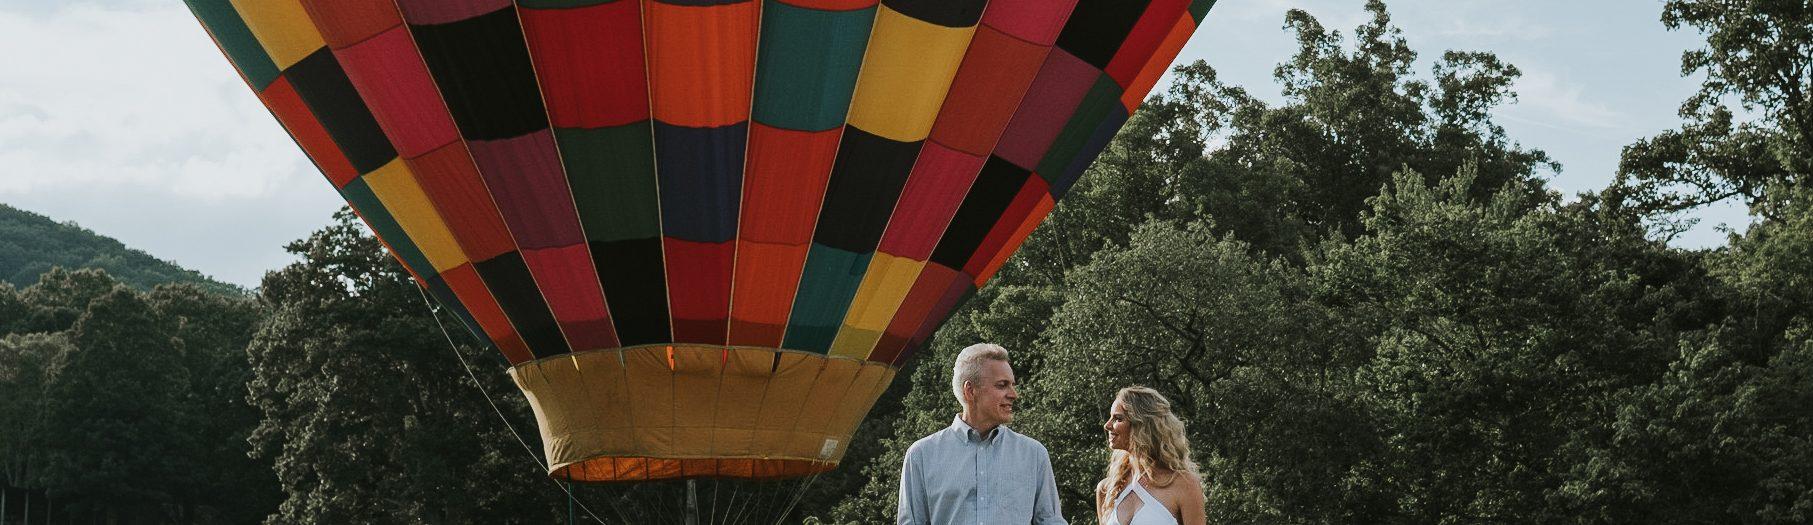 Jill + Dave | Hot Air Balloon Engagement Session